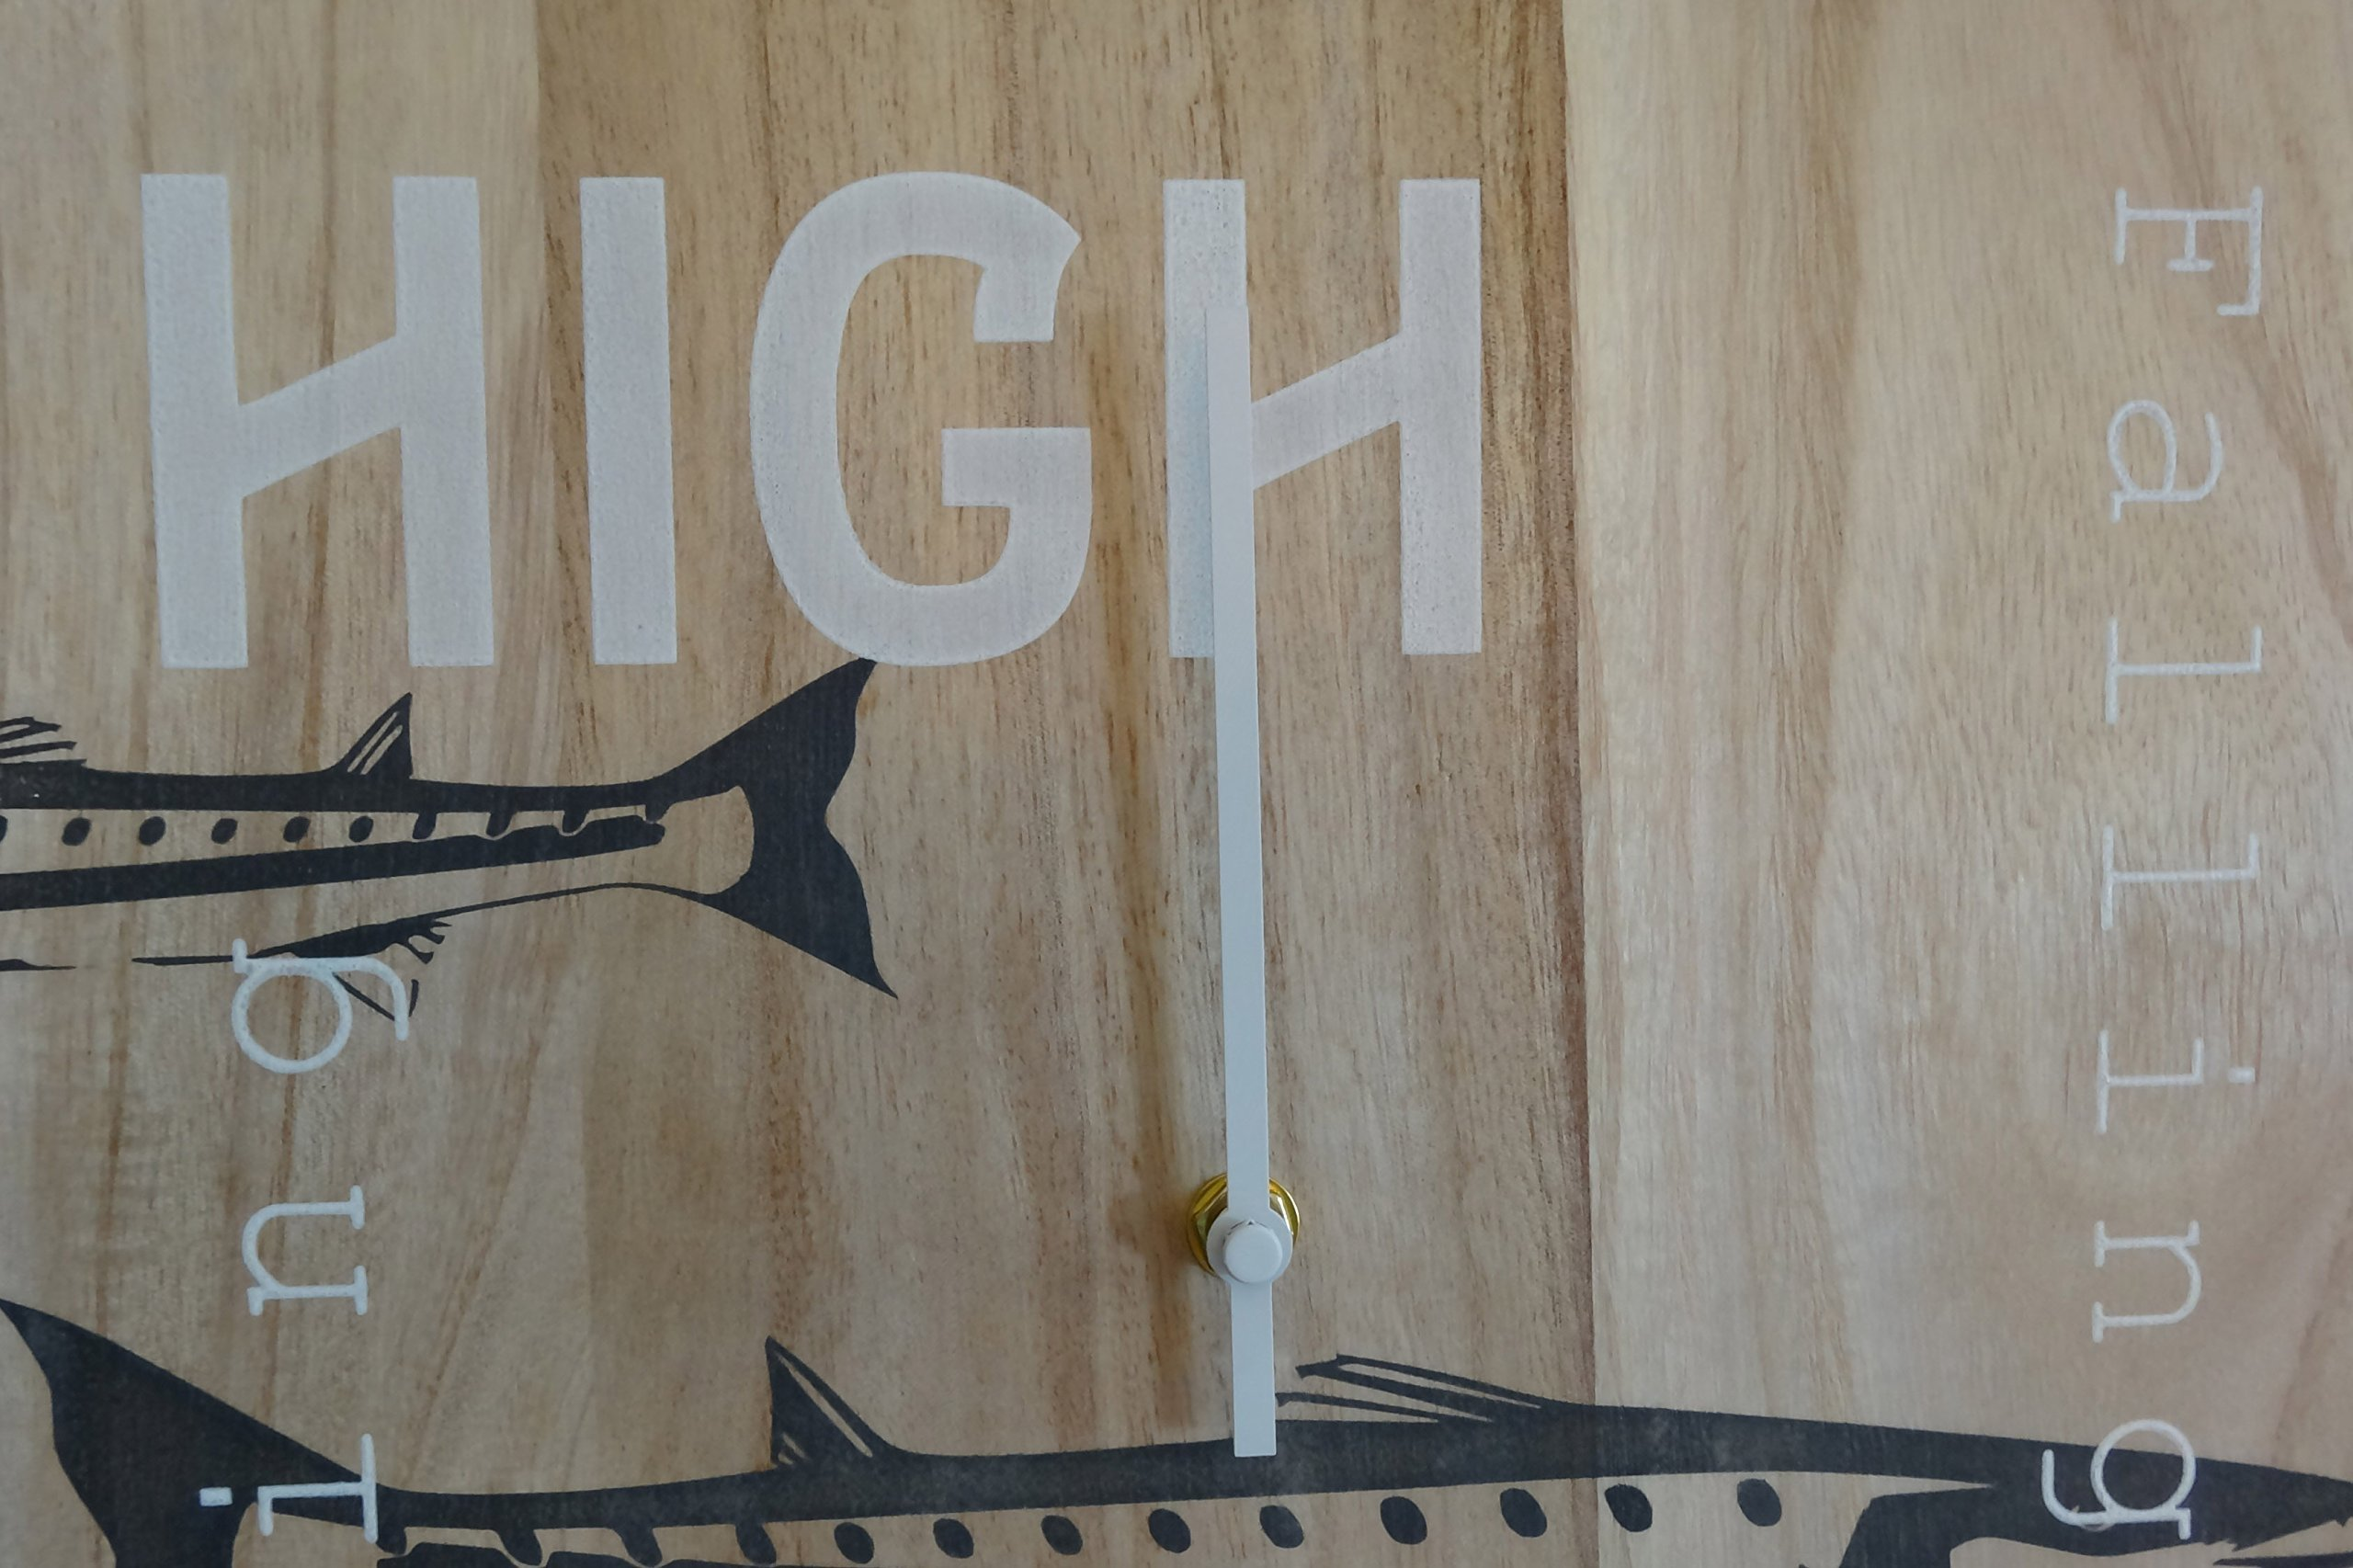 OldBleu Tide Clock Timer - Handmade - Nautical - For the Fisherman by OldBleu (Image #3)